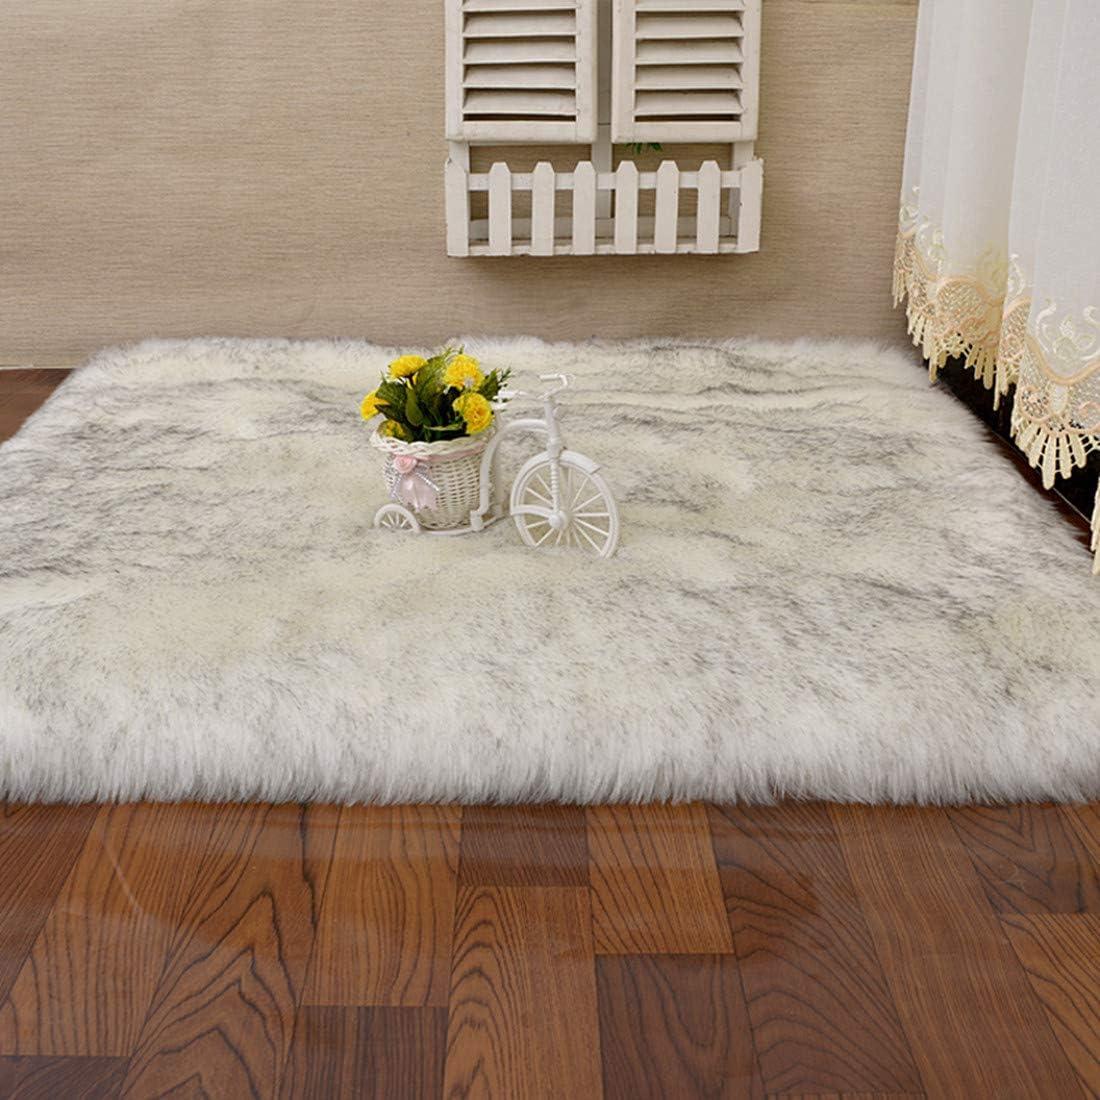 Fashion Suit Rectangle Faux Fur Sheepskin Area Rug Baby Bedroom Fluff Floor Sofa Rugs Home Decorative Shaggy Carpet White Black,8×10 Feet